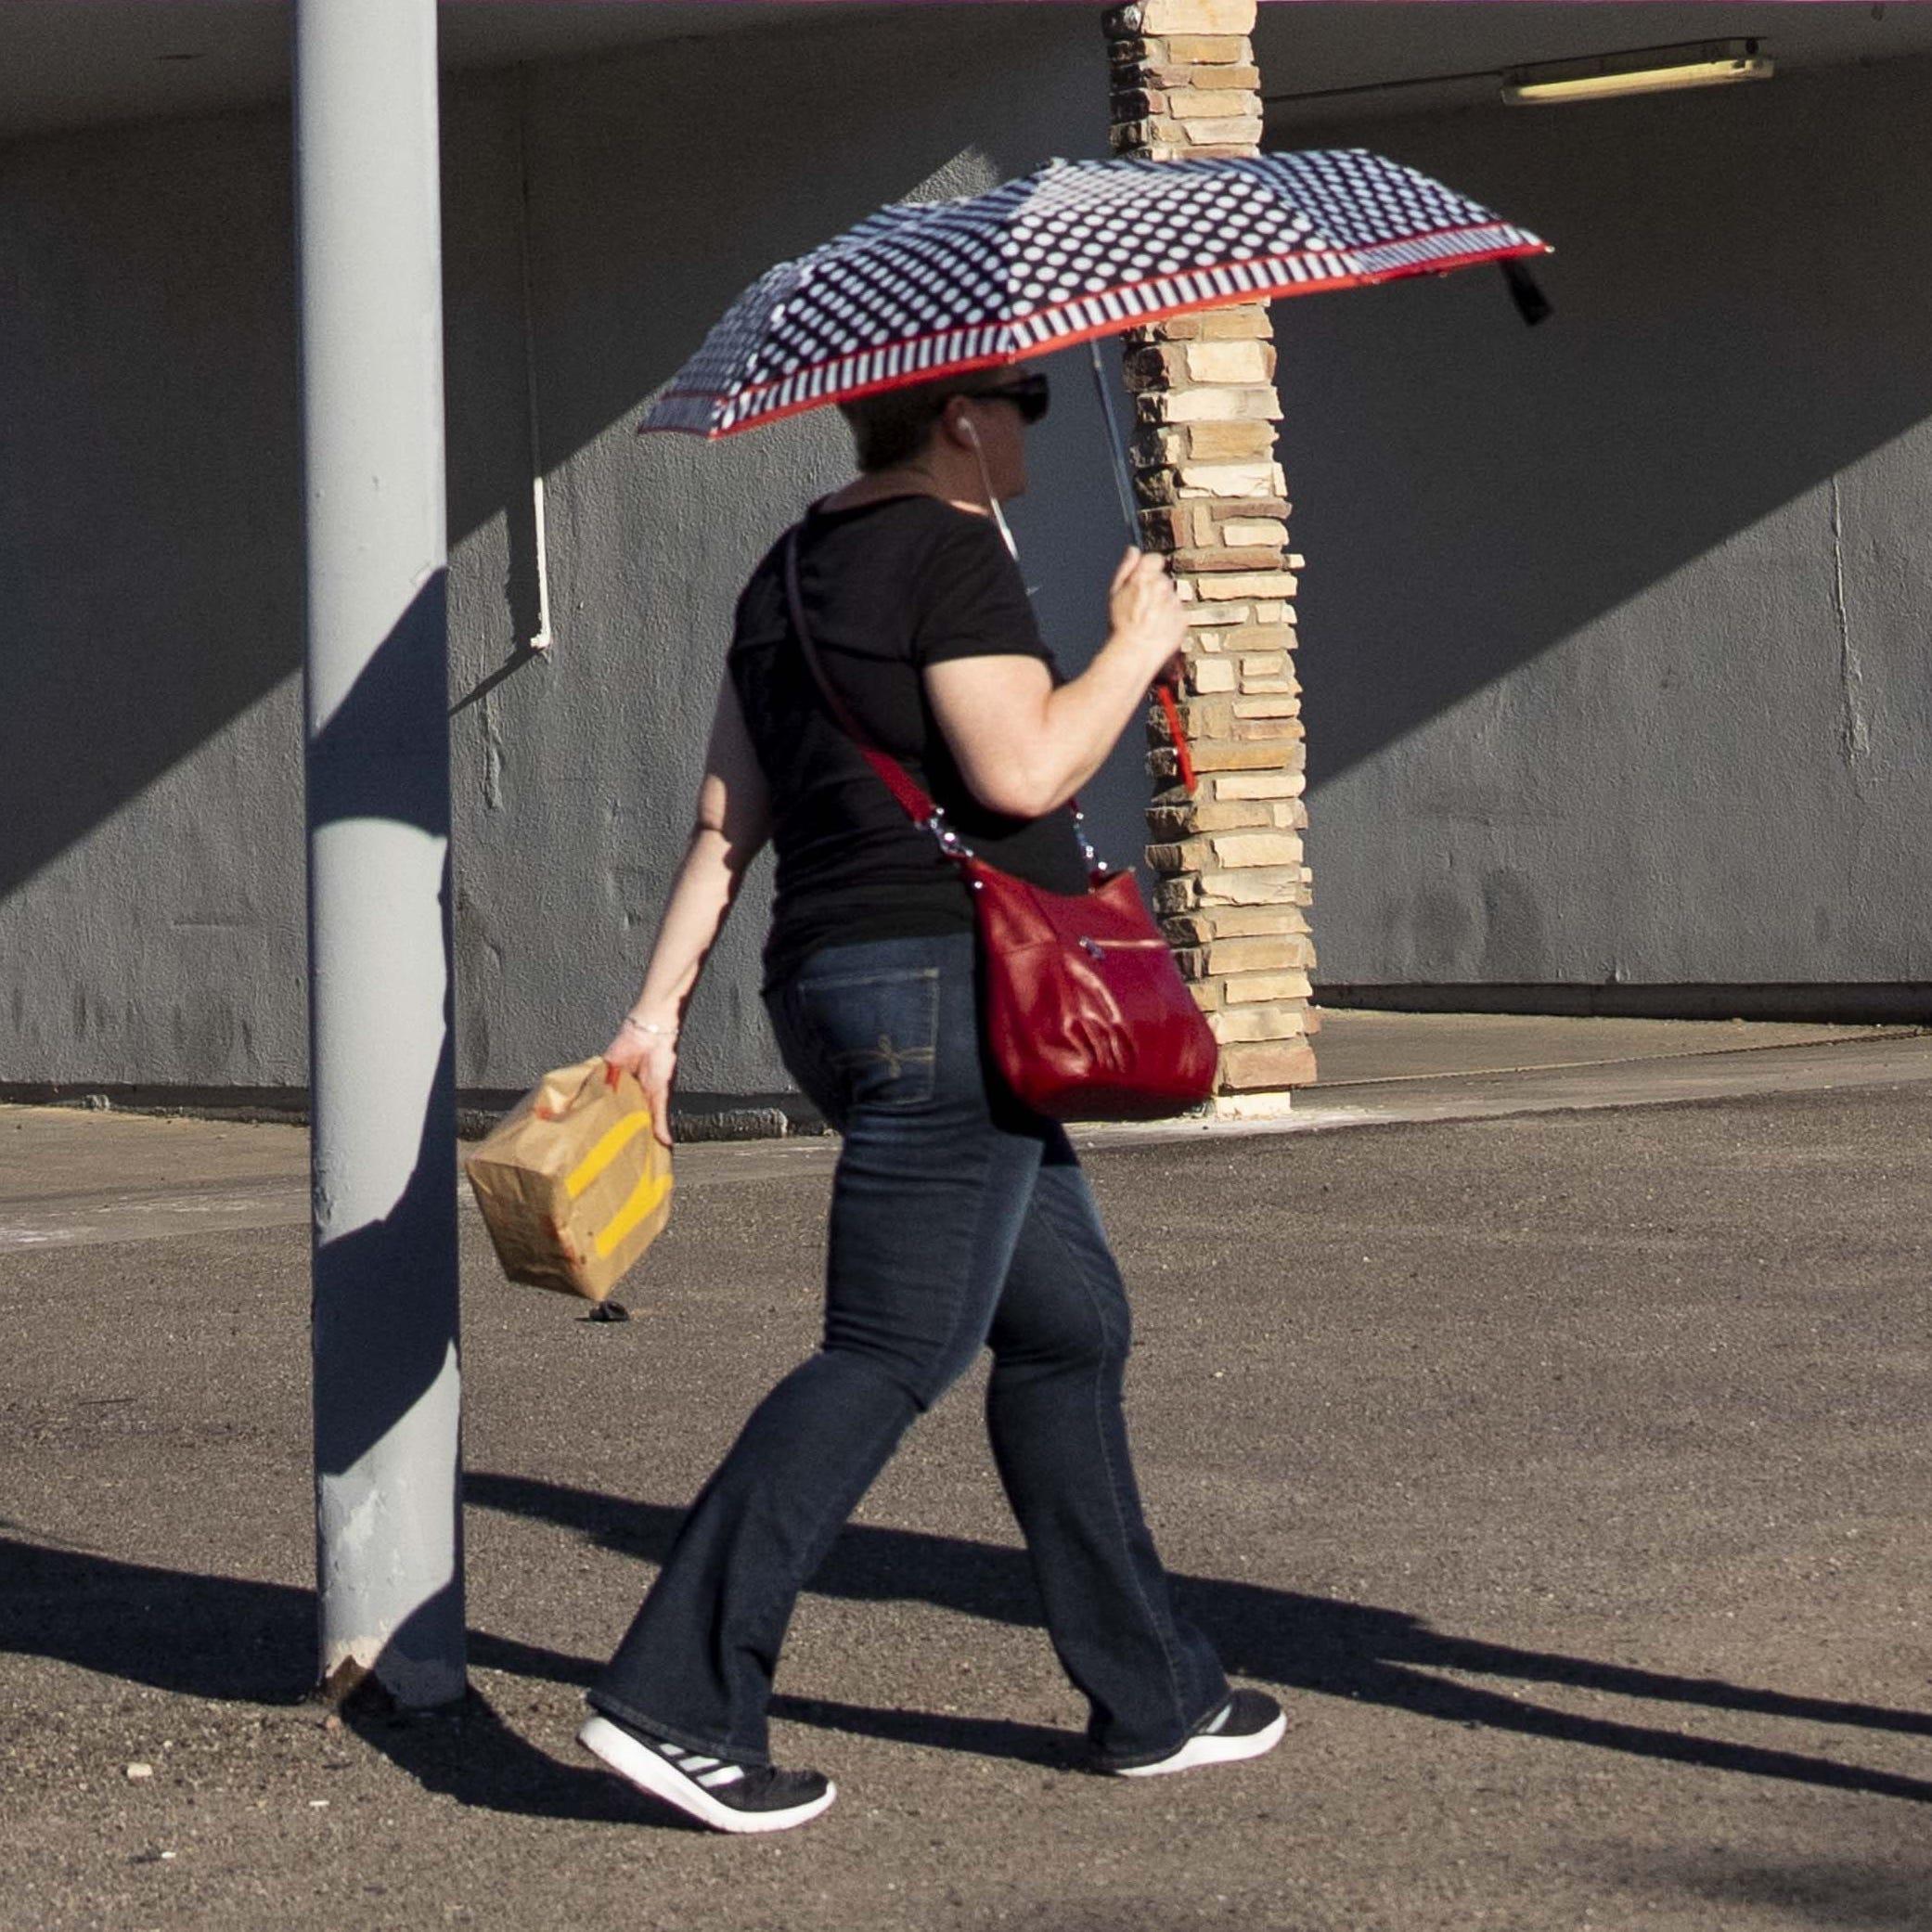 Whew! 100 degrees in Phoenix already?